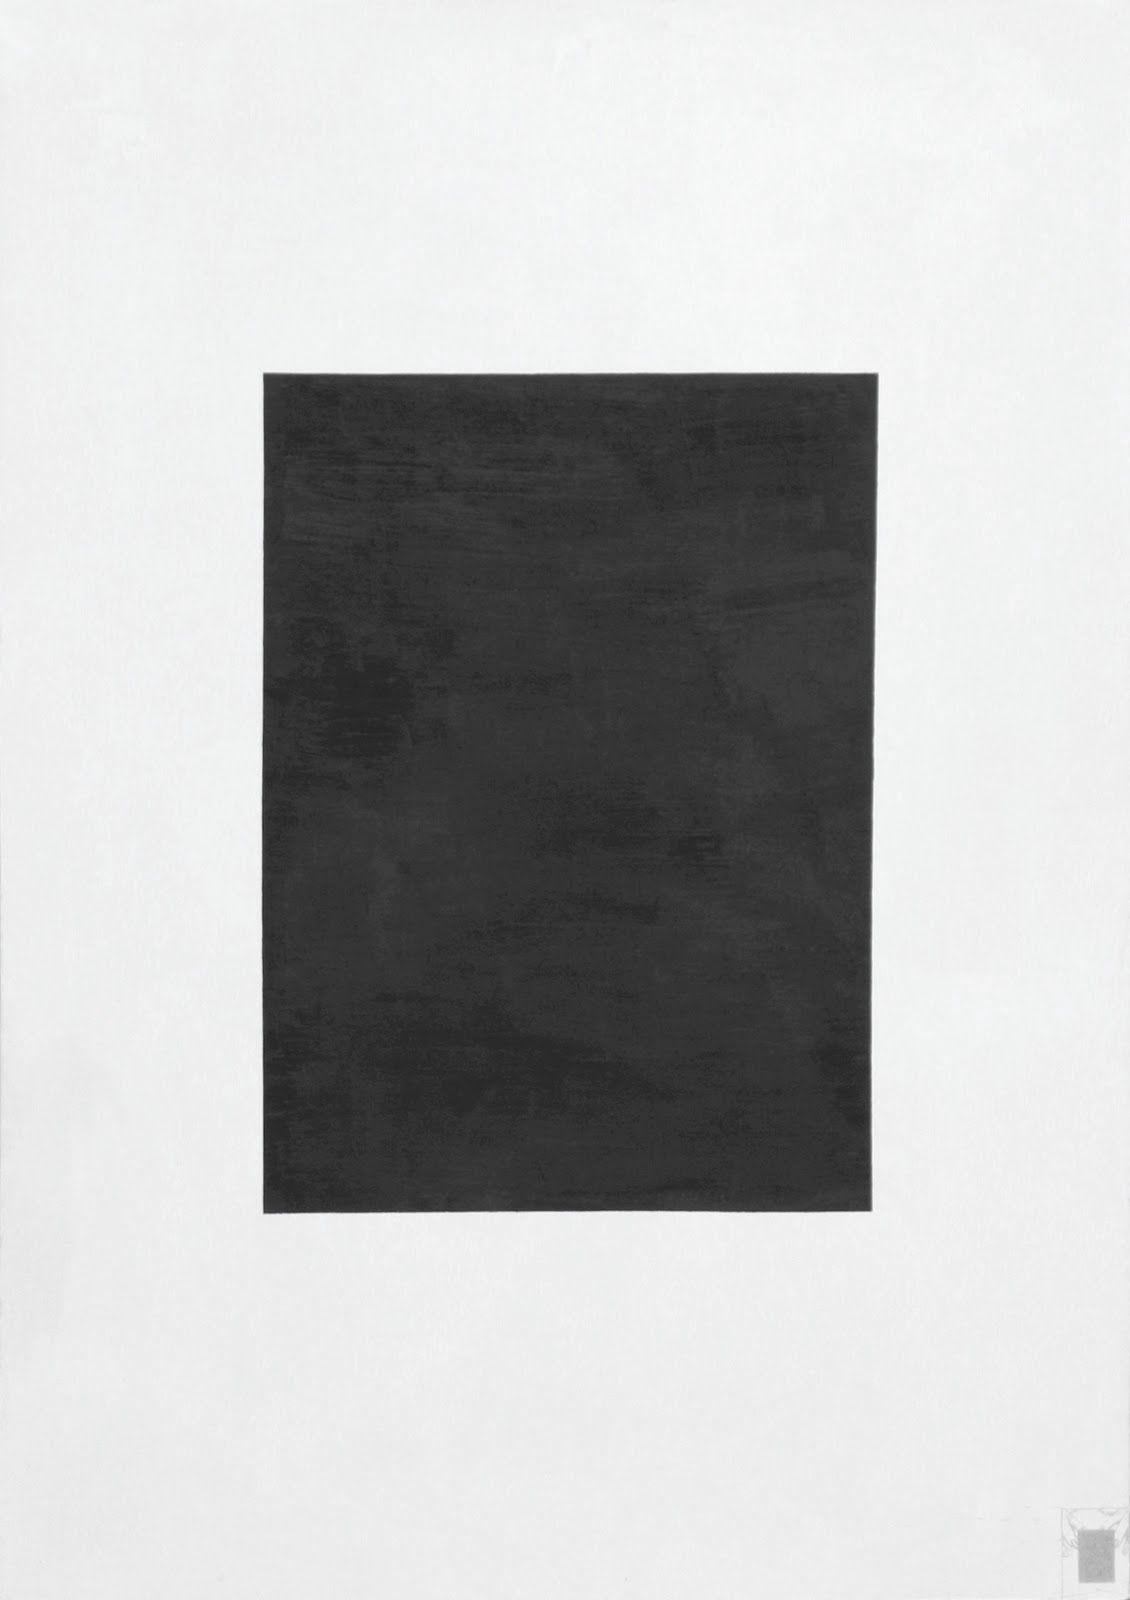 | BLACK SQUARE | gianfranco piazzini |